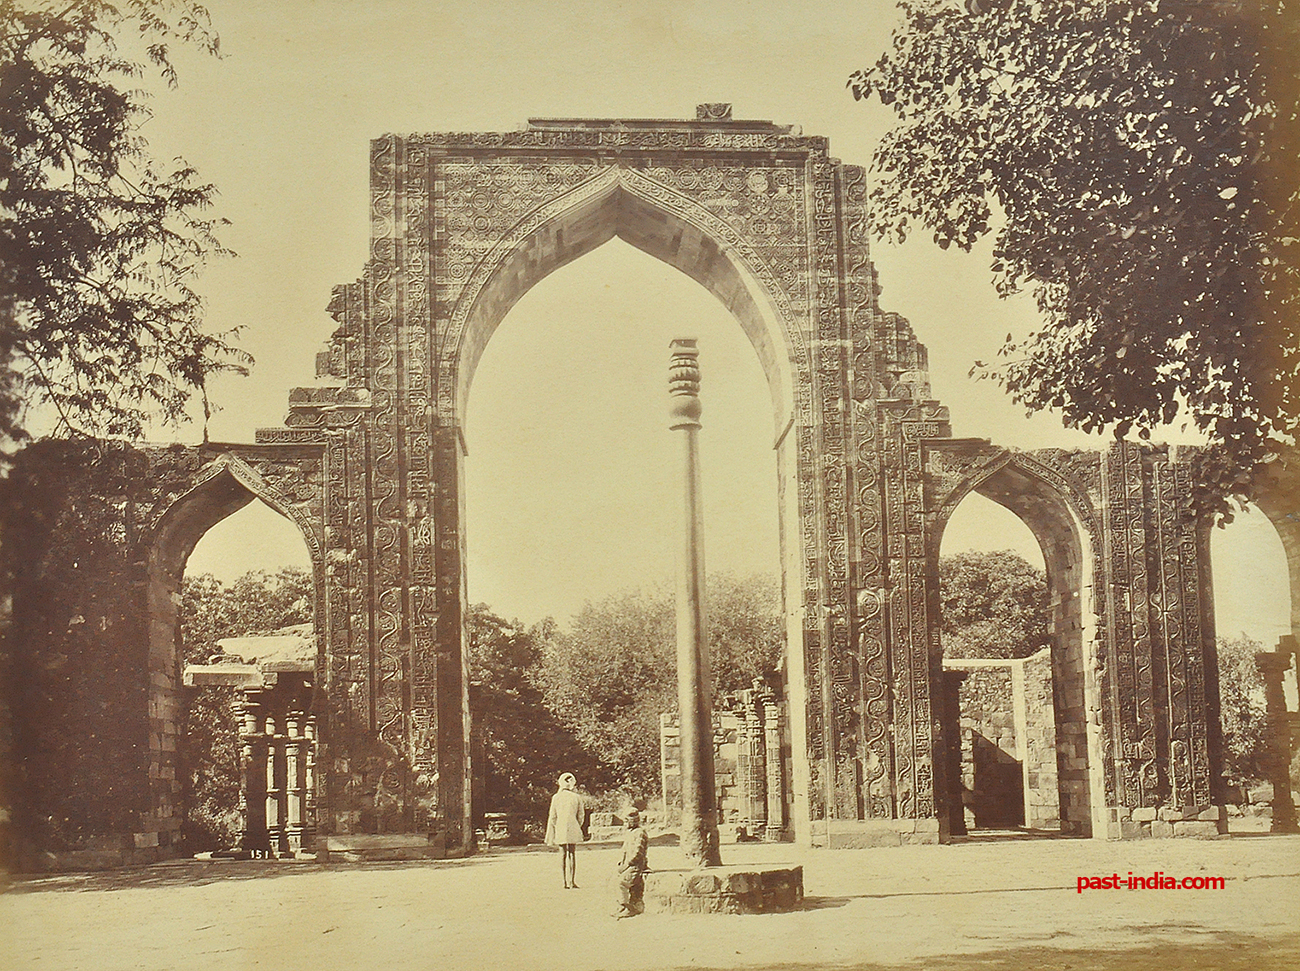 Iron Pillar & Arch At Qutub Minar – Old Photo 1880